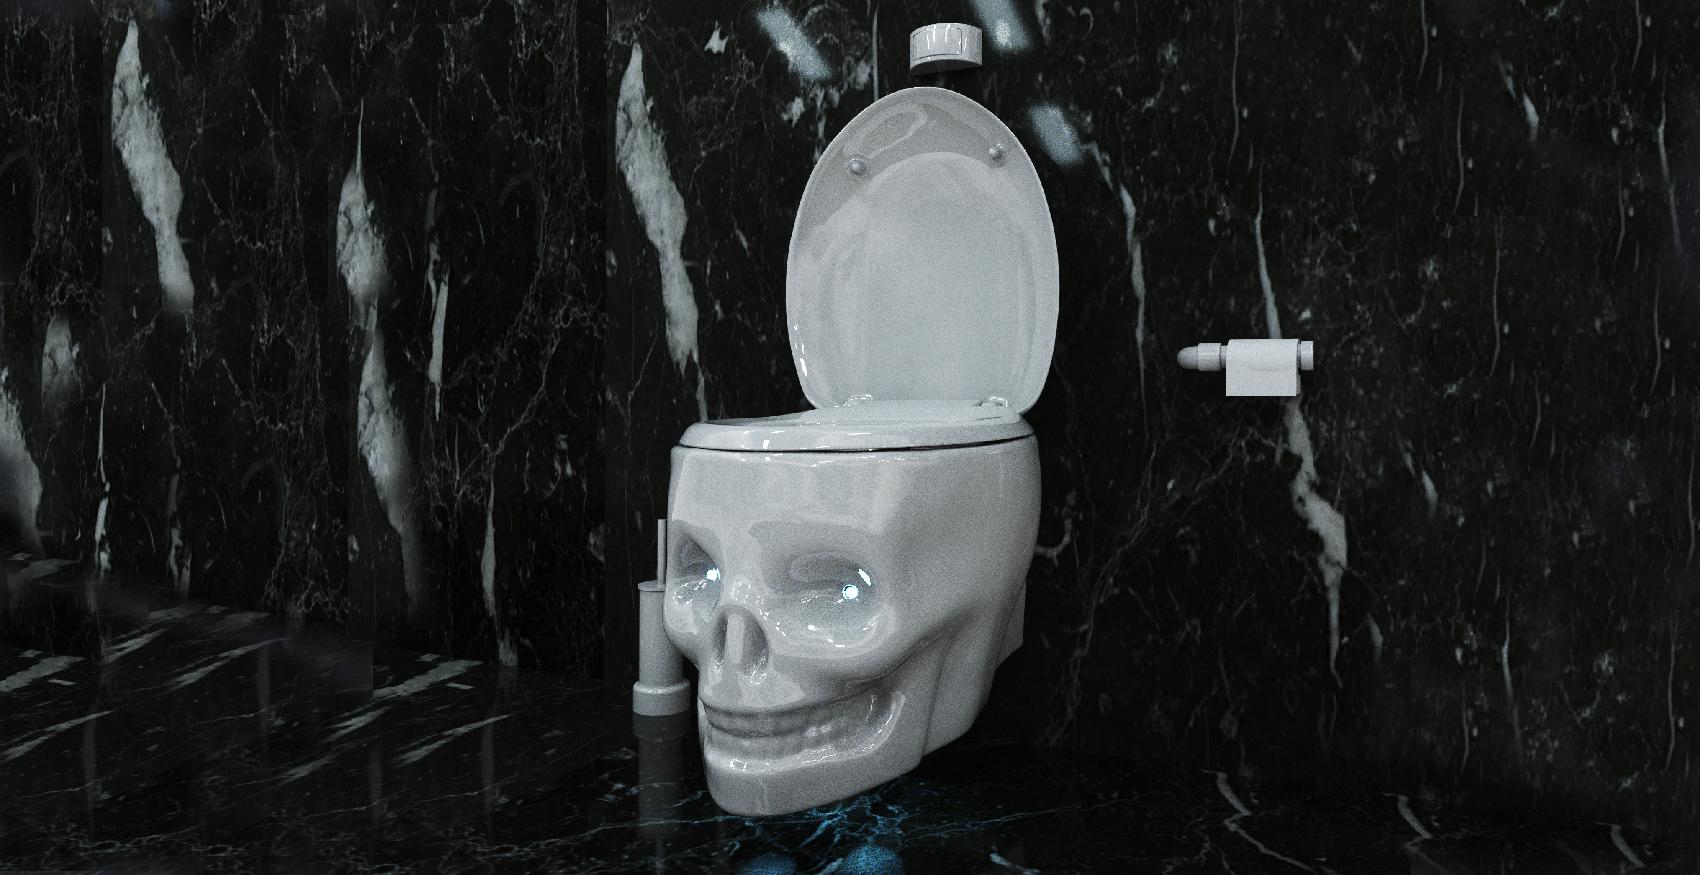 blanc water throne wc tete de mort toilet skull